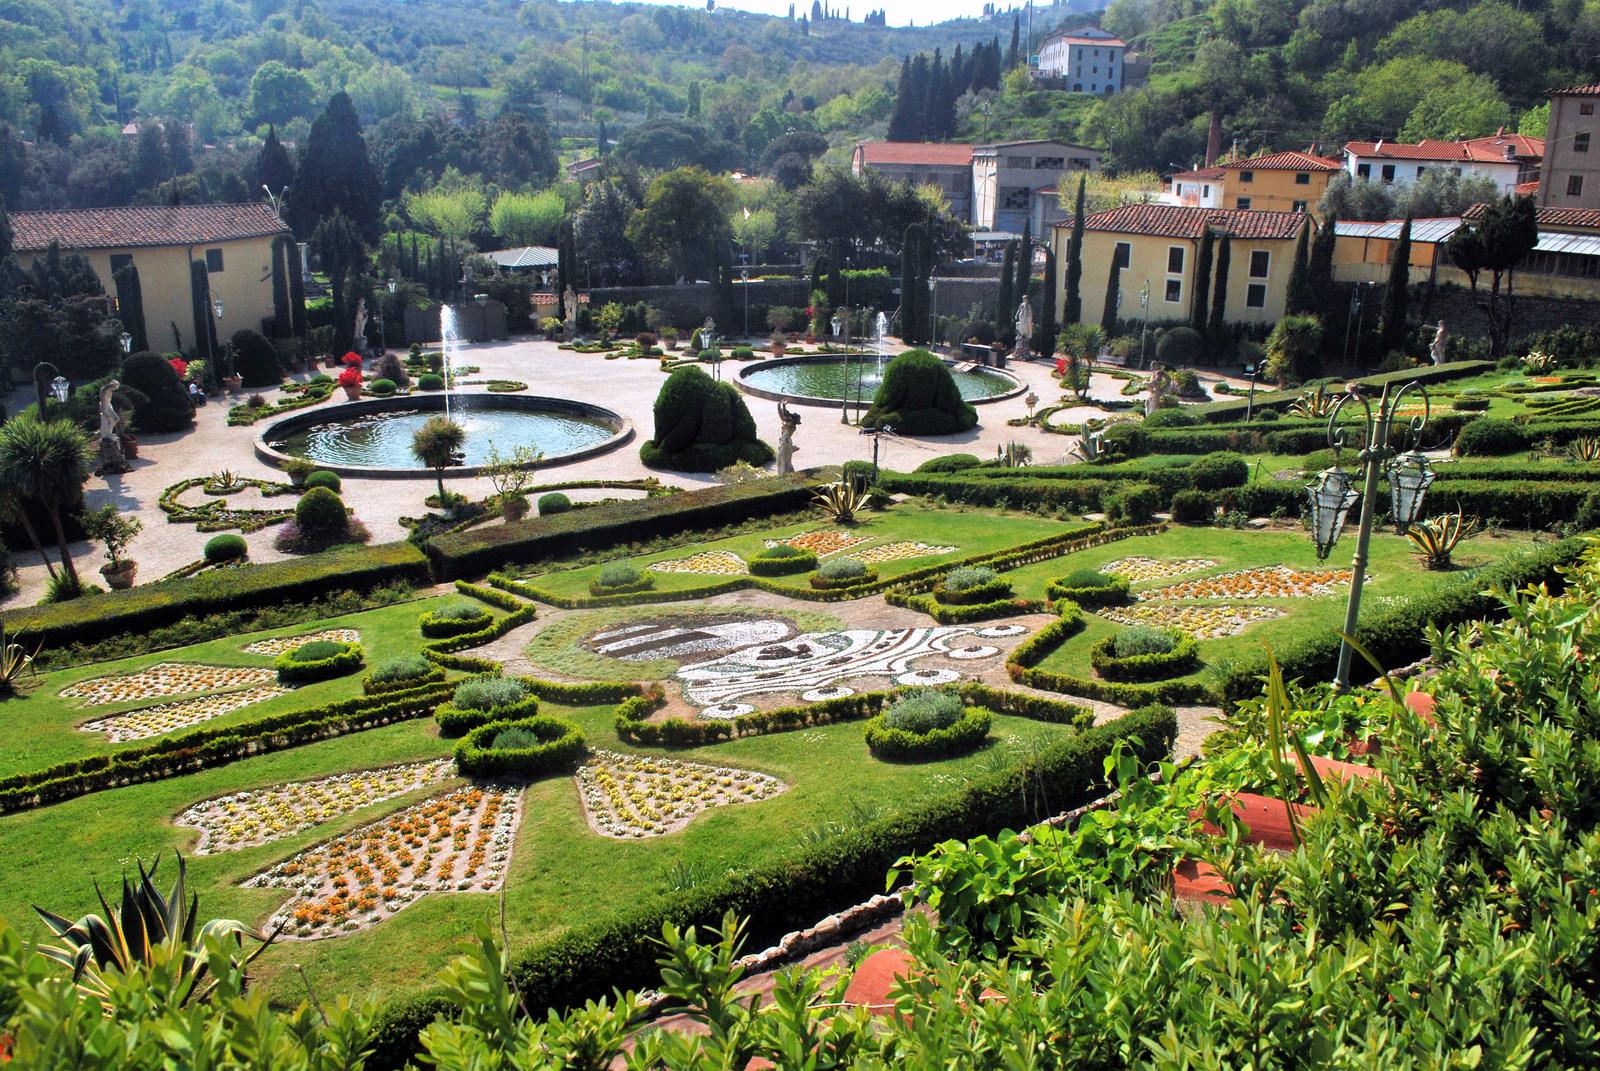 Villa Garzoni and its garden | Visit Tuscany